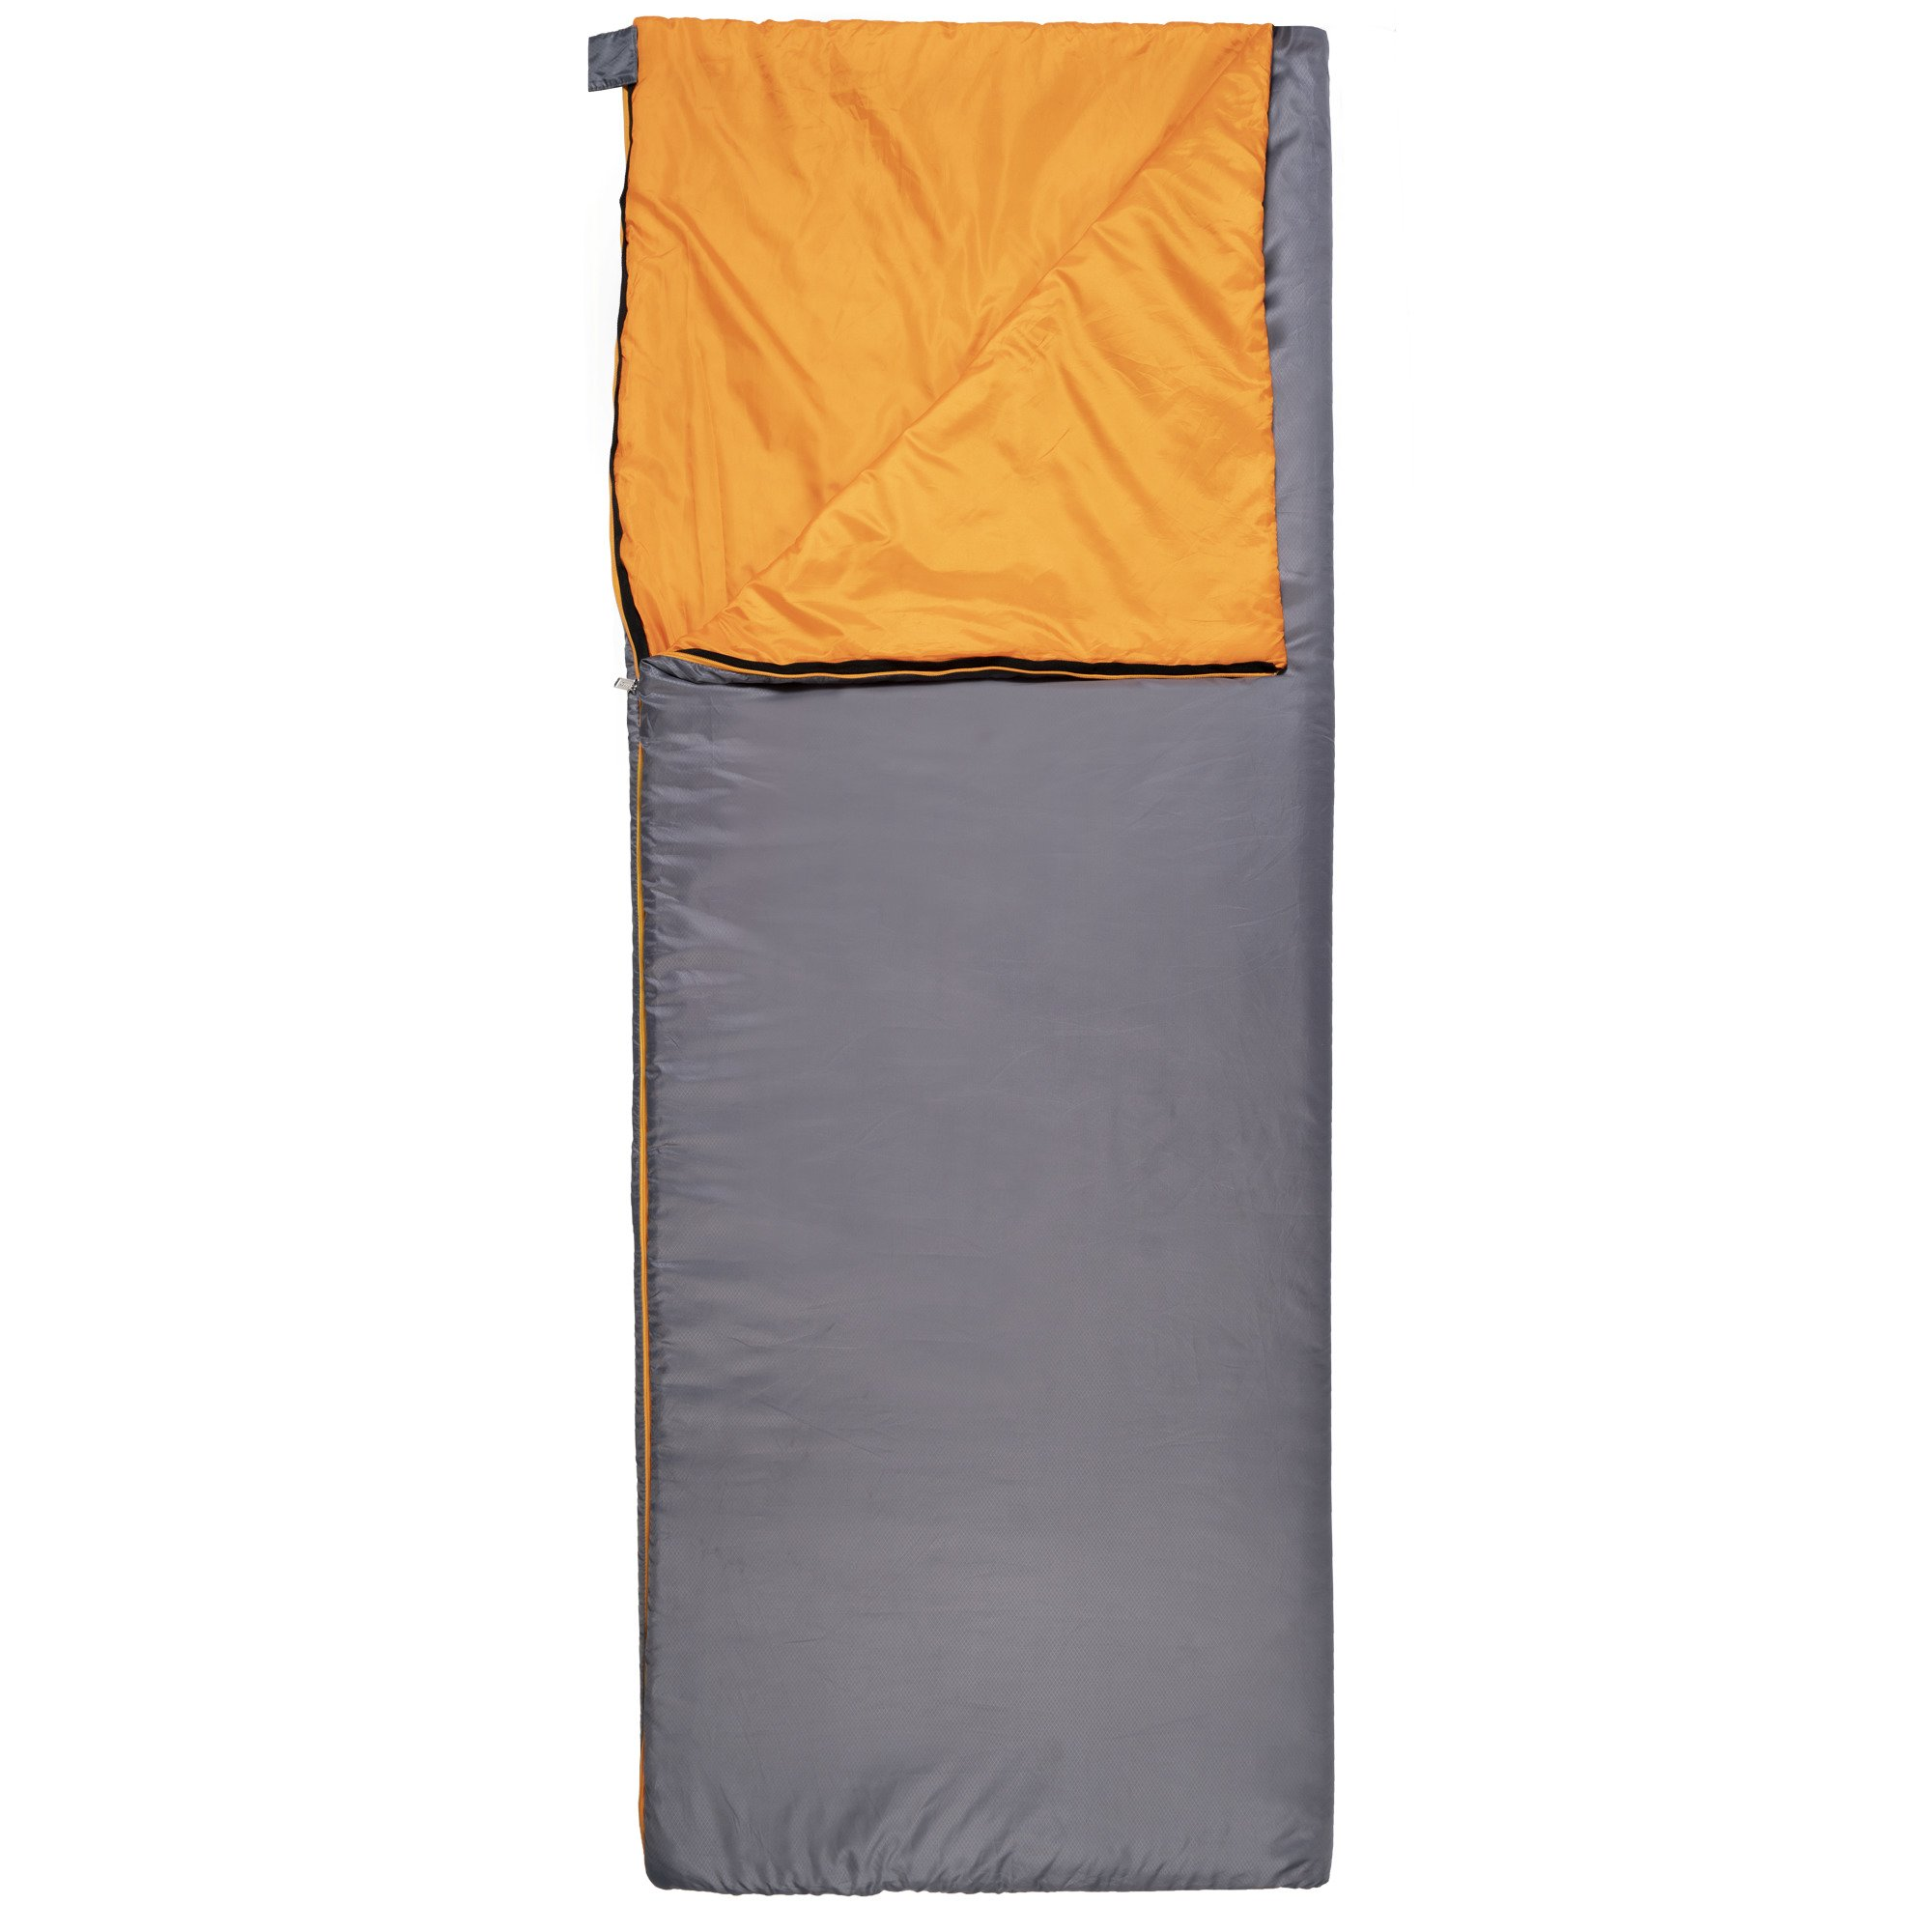 OUTPOST (RECTANGULAR) SLEEPING BAG